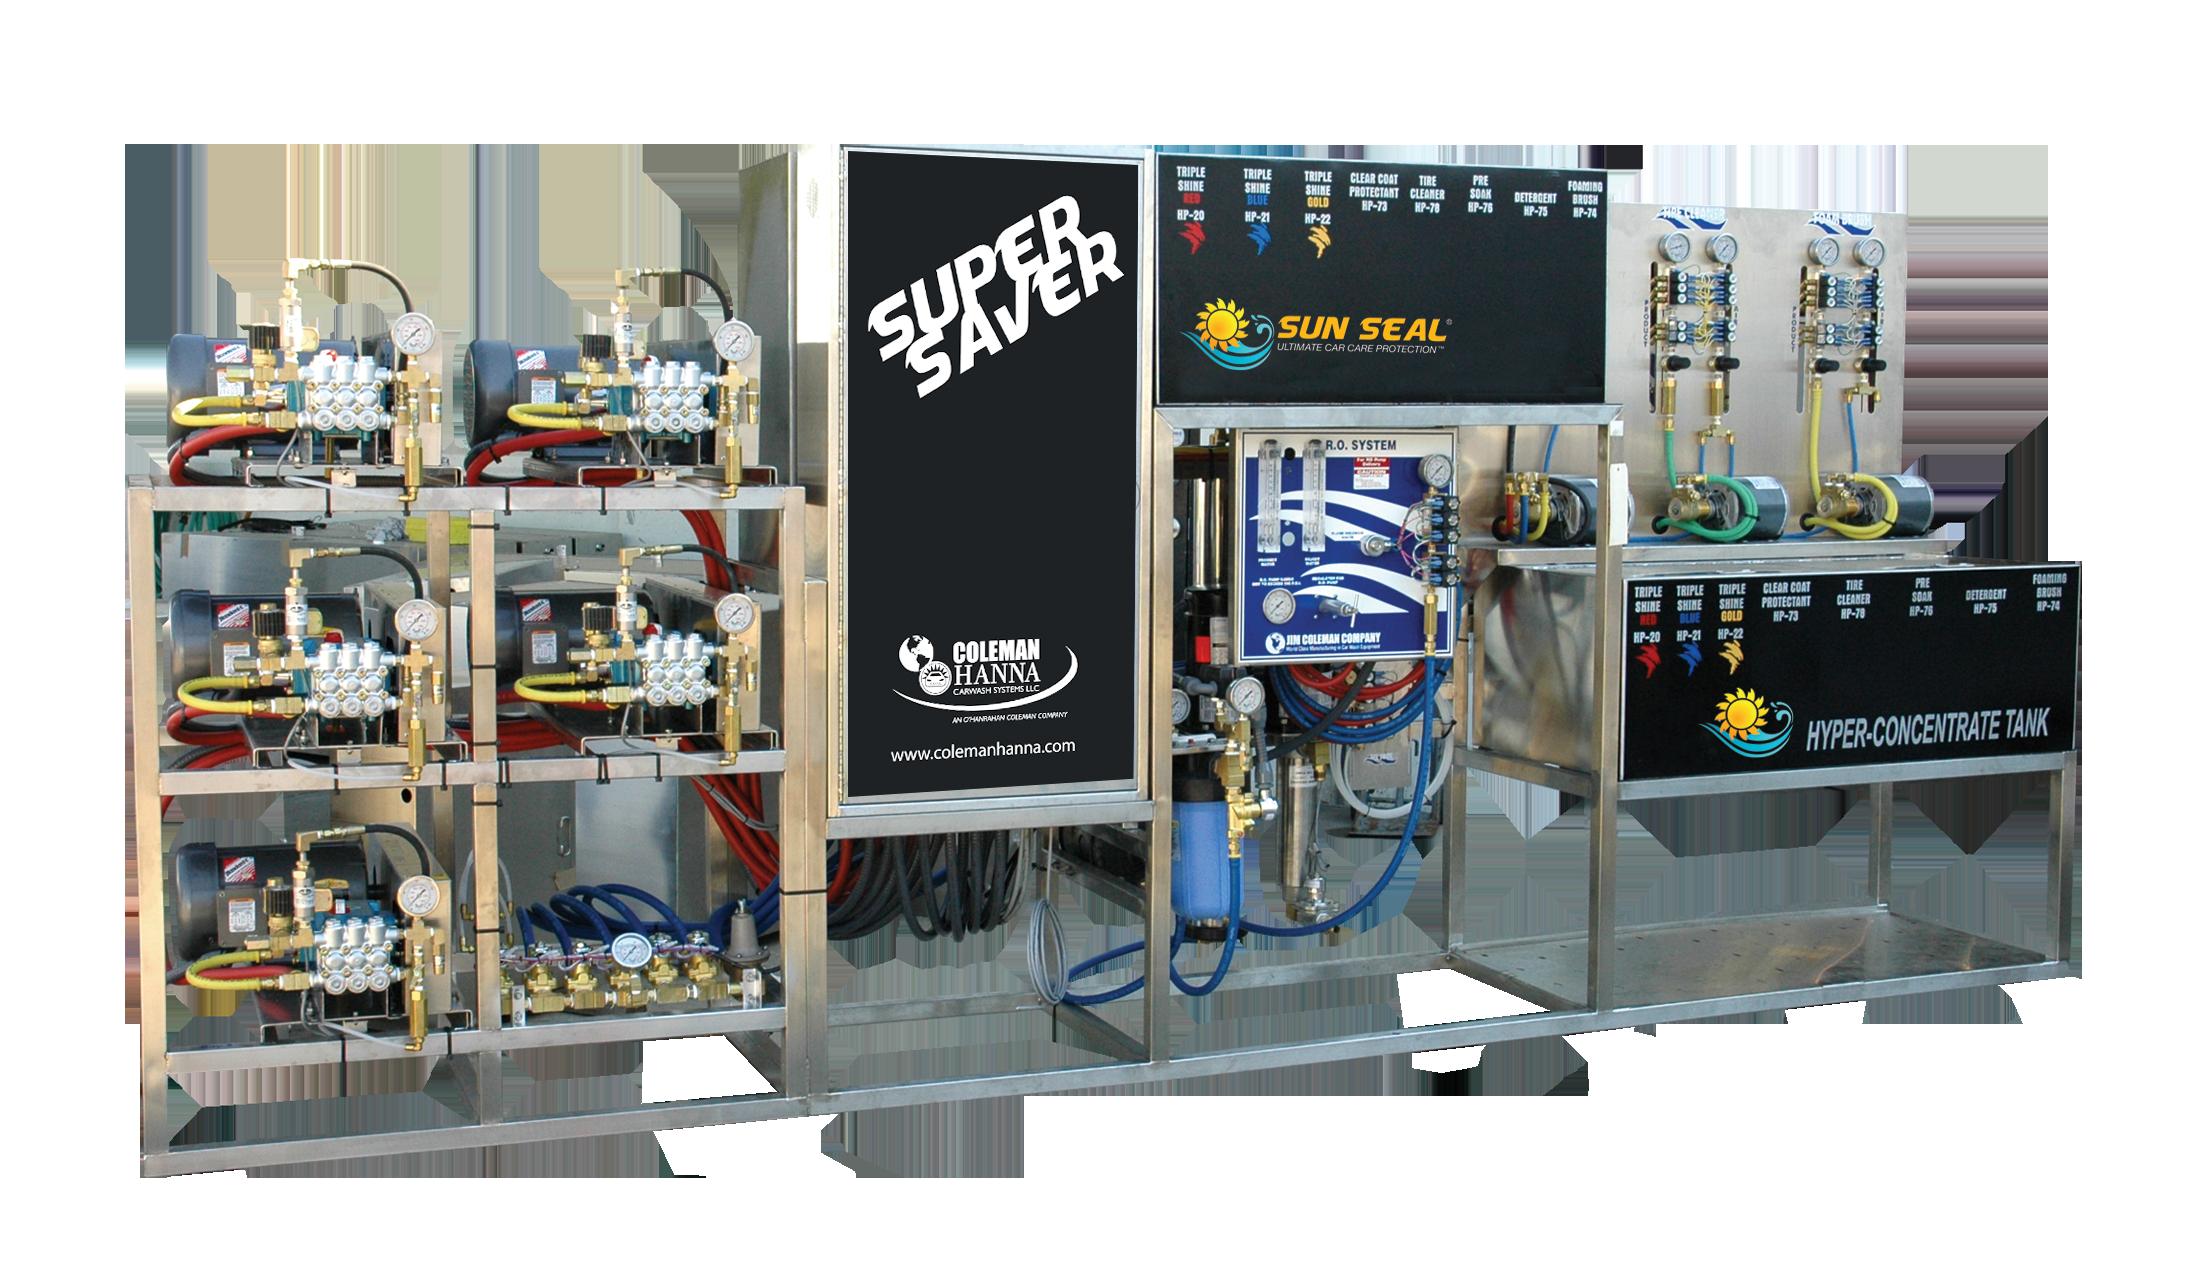 Super Saver Self Serve Pumping Equipment